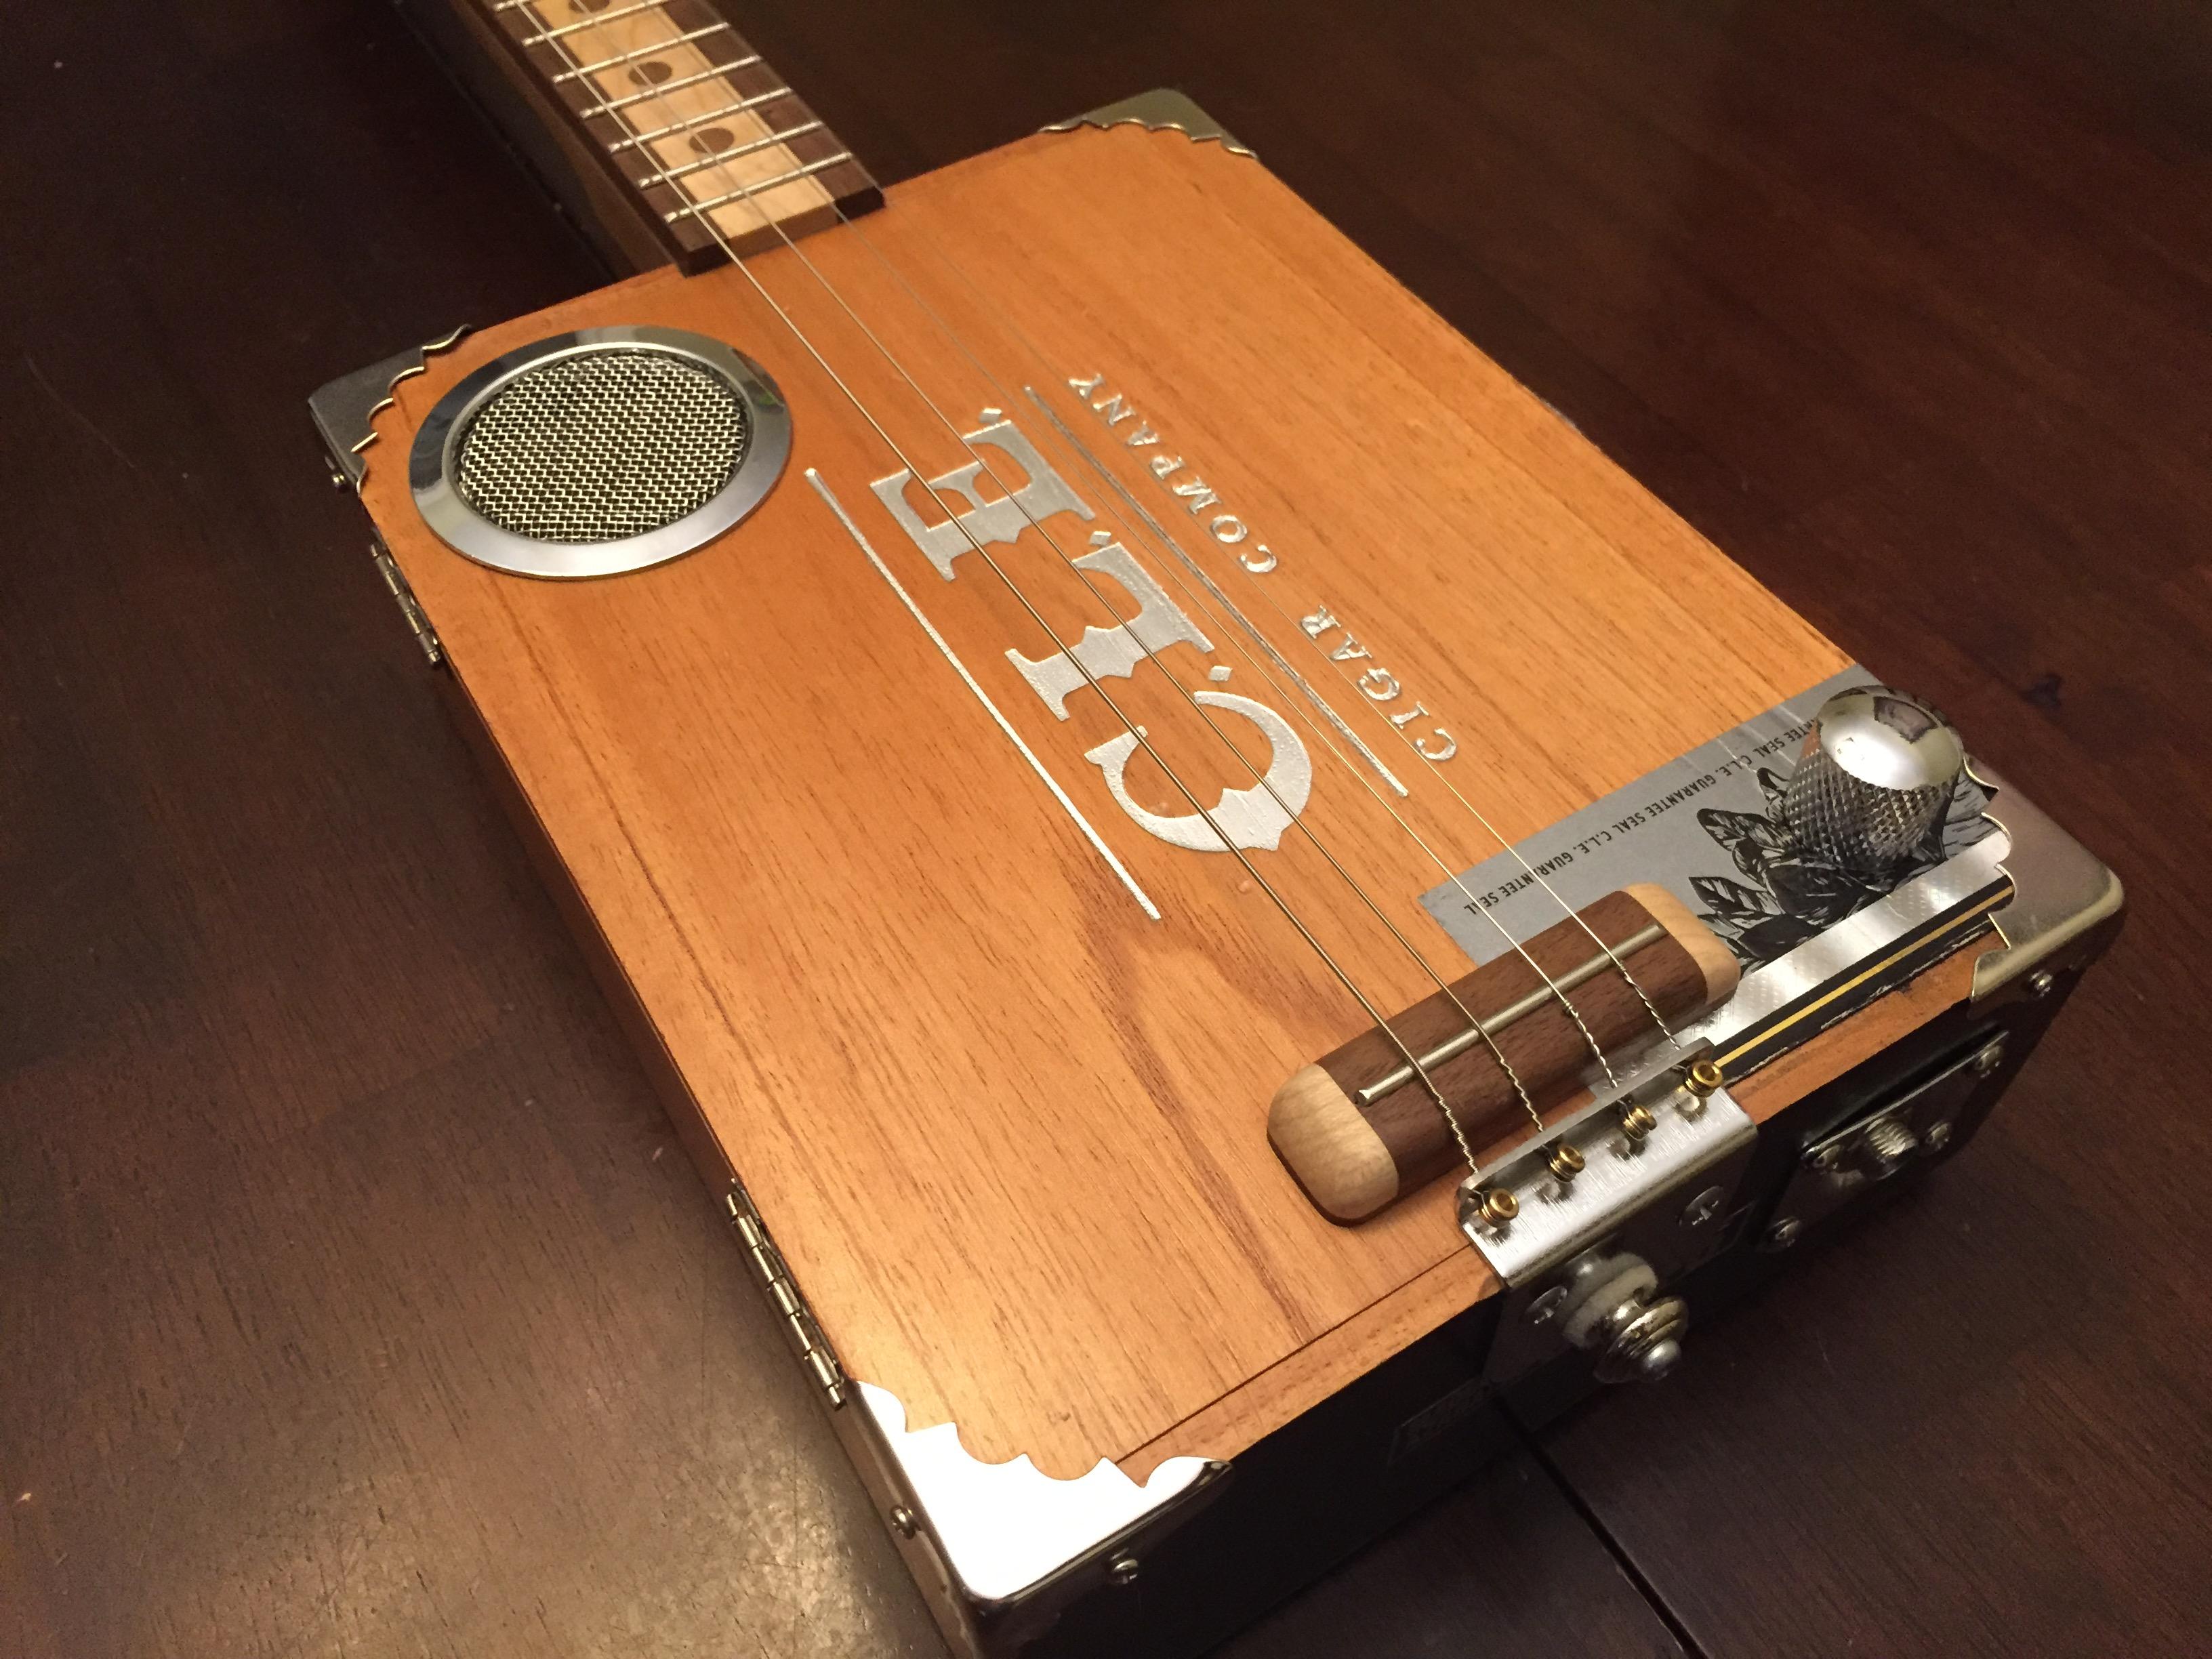 CLE Cigar Box Guitar Build - Custom bridge, tailpiece, v/c, sound-hole cover and corner details.